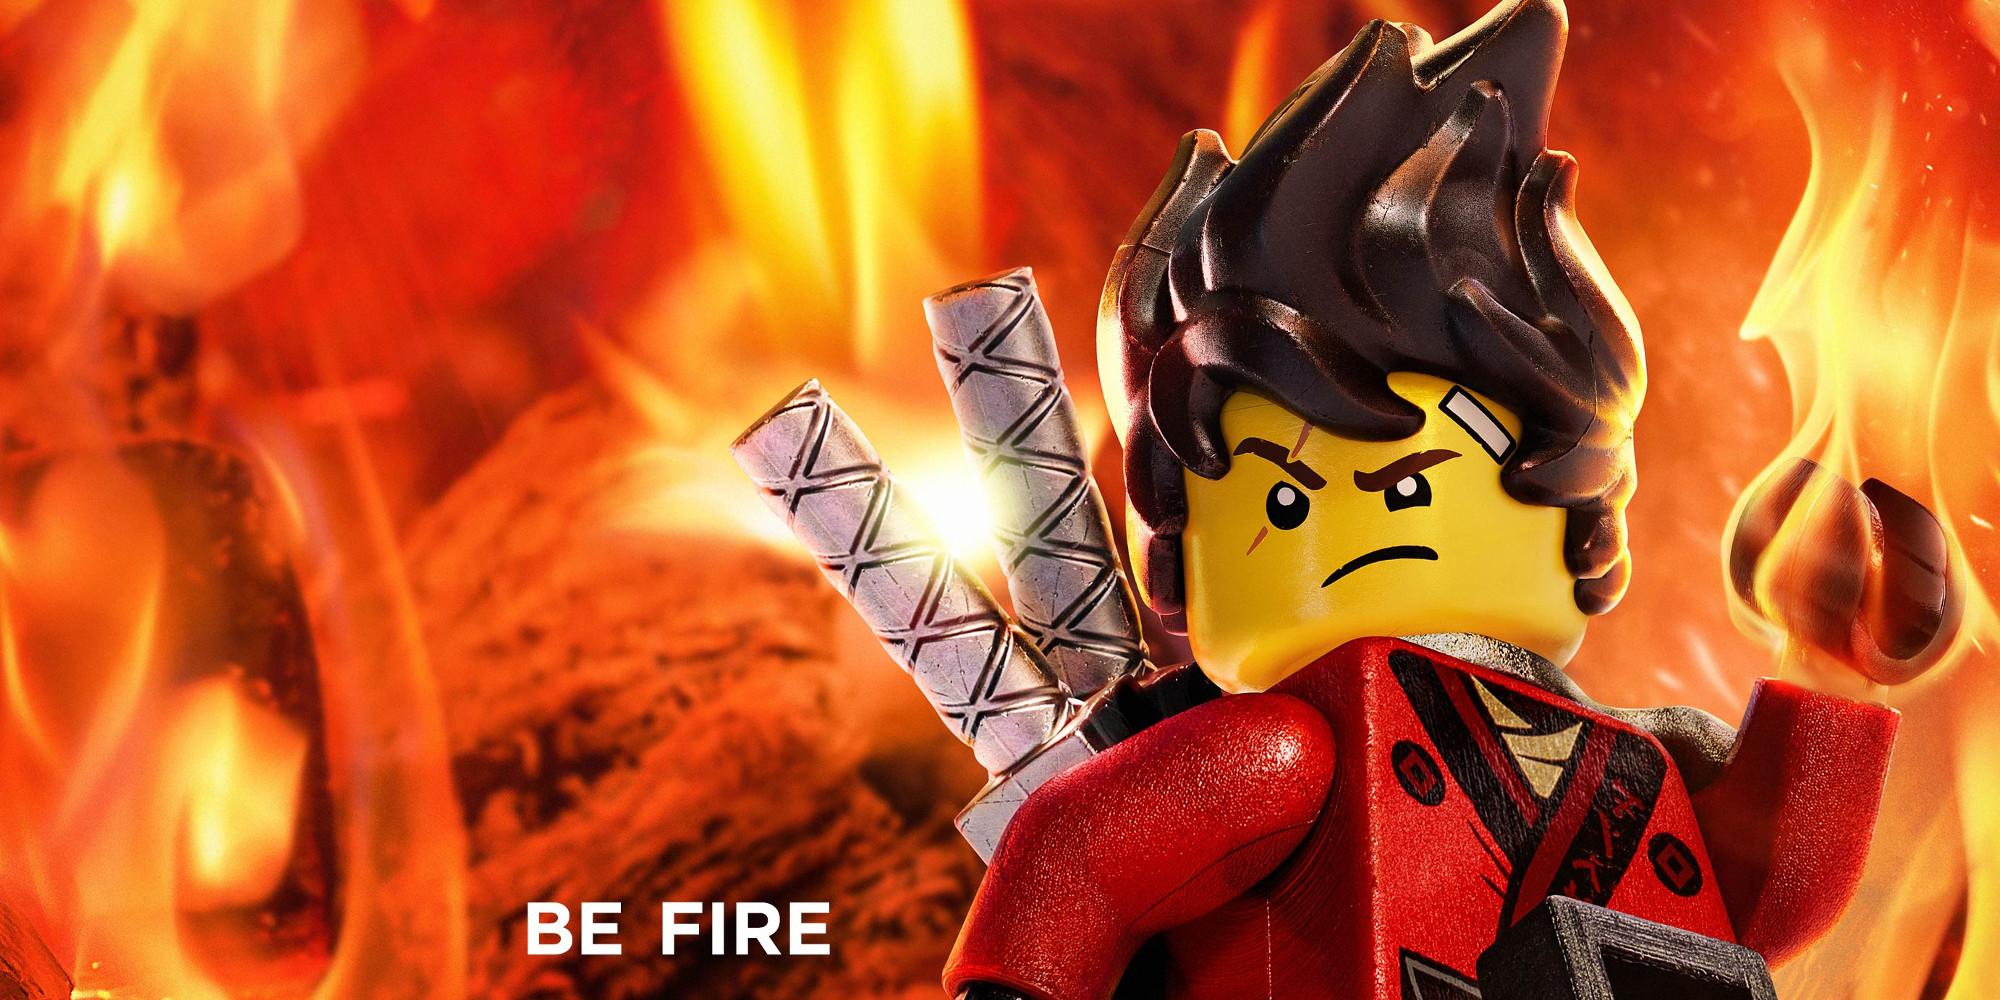 Lego Ninjago Movie Character Postes - Screen Rant